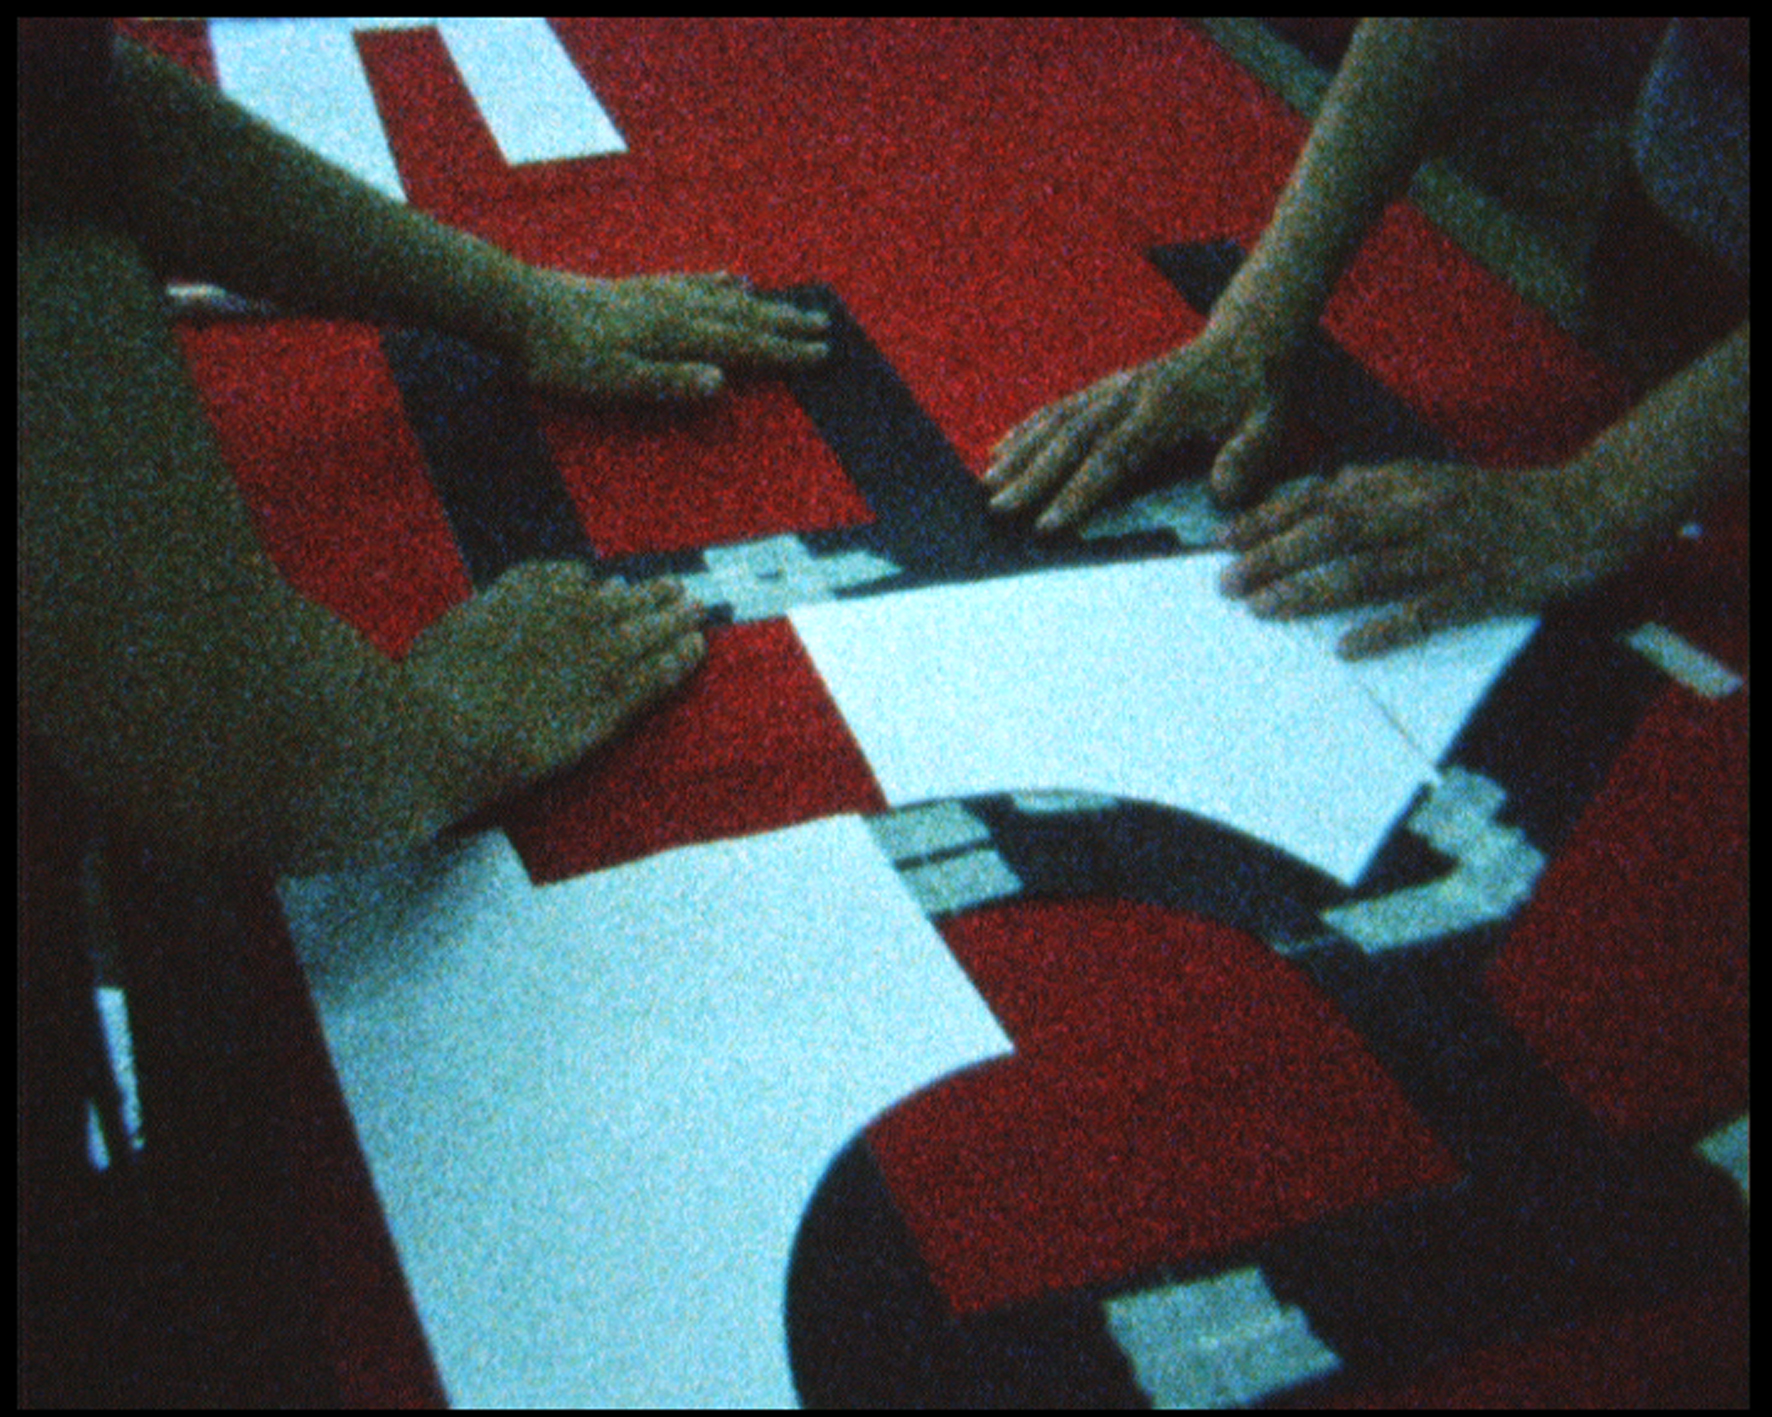 Mona Vatamanu & Florin Tudor   Poem , 2009 single channel color video transferred from super 8mm film duration 7:00